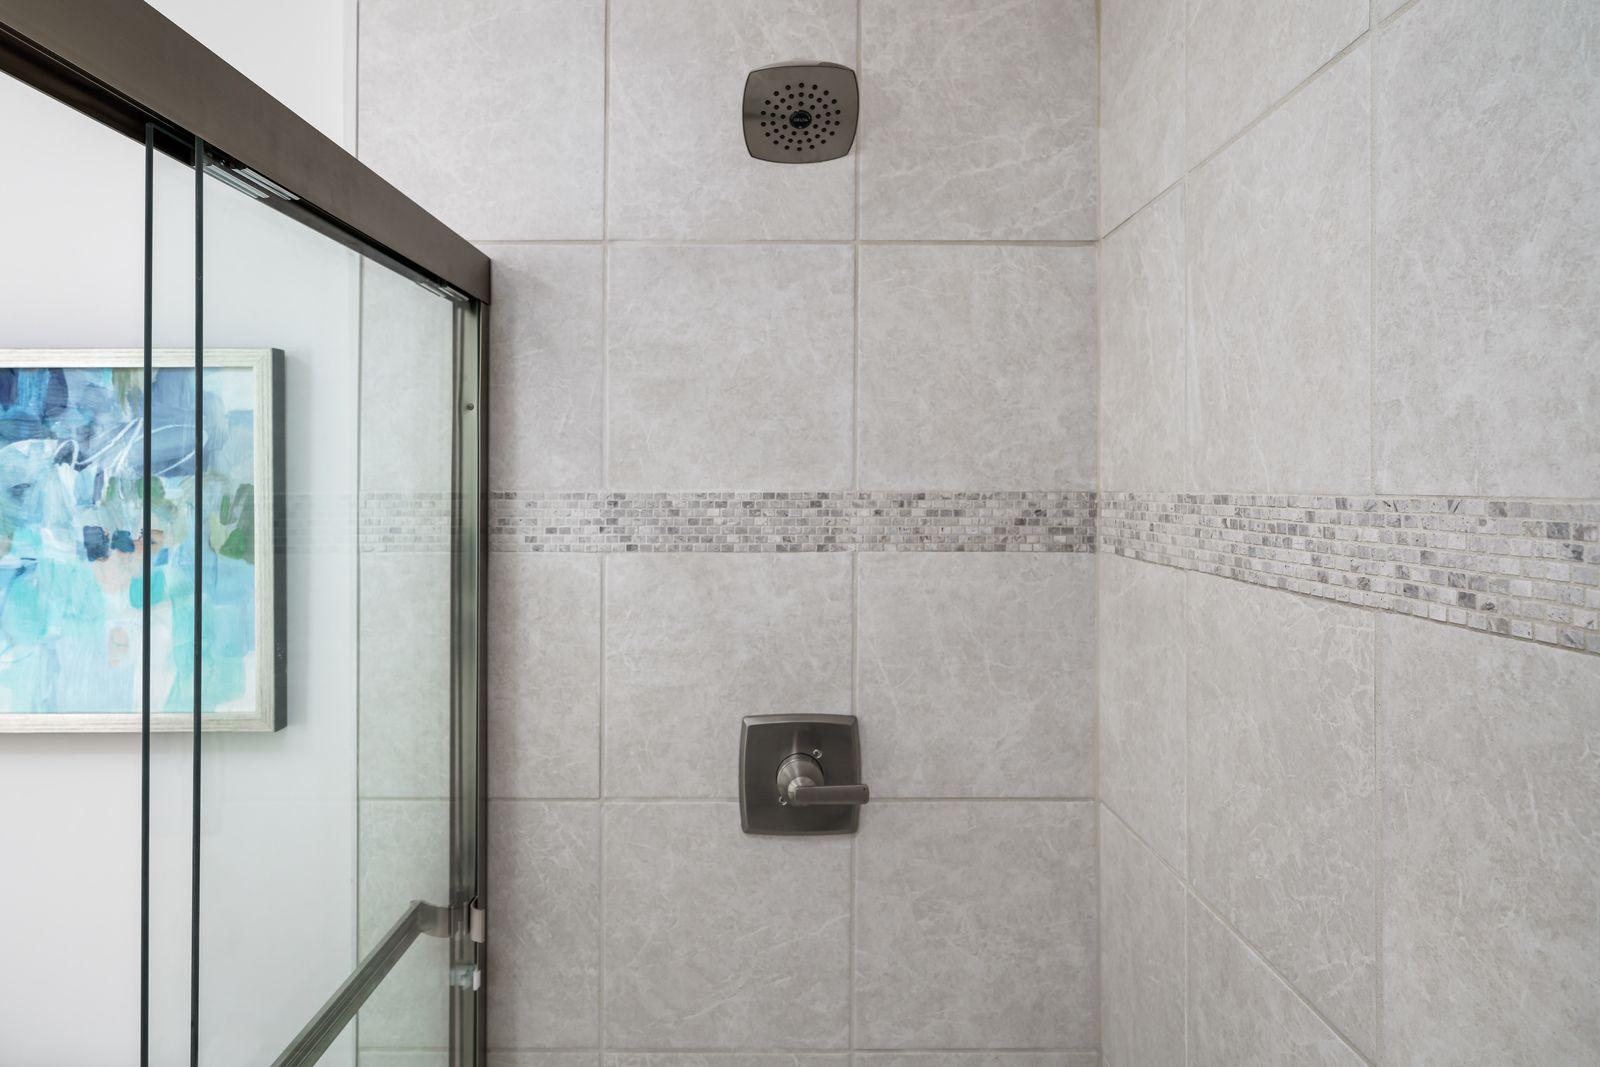 Bathroom featured in the Turks & Caicos By Ryan Homes in Washington, VA